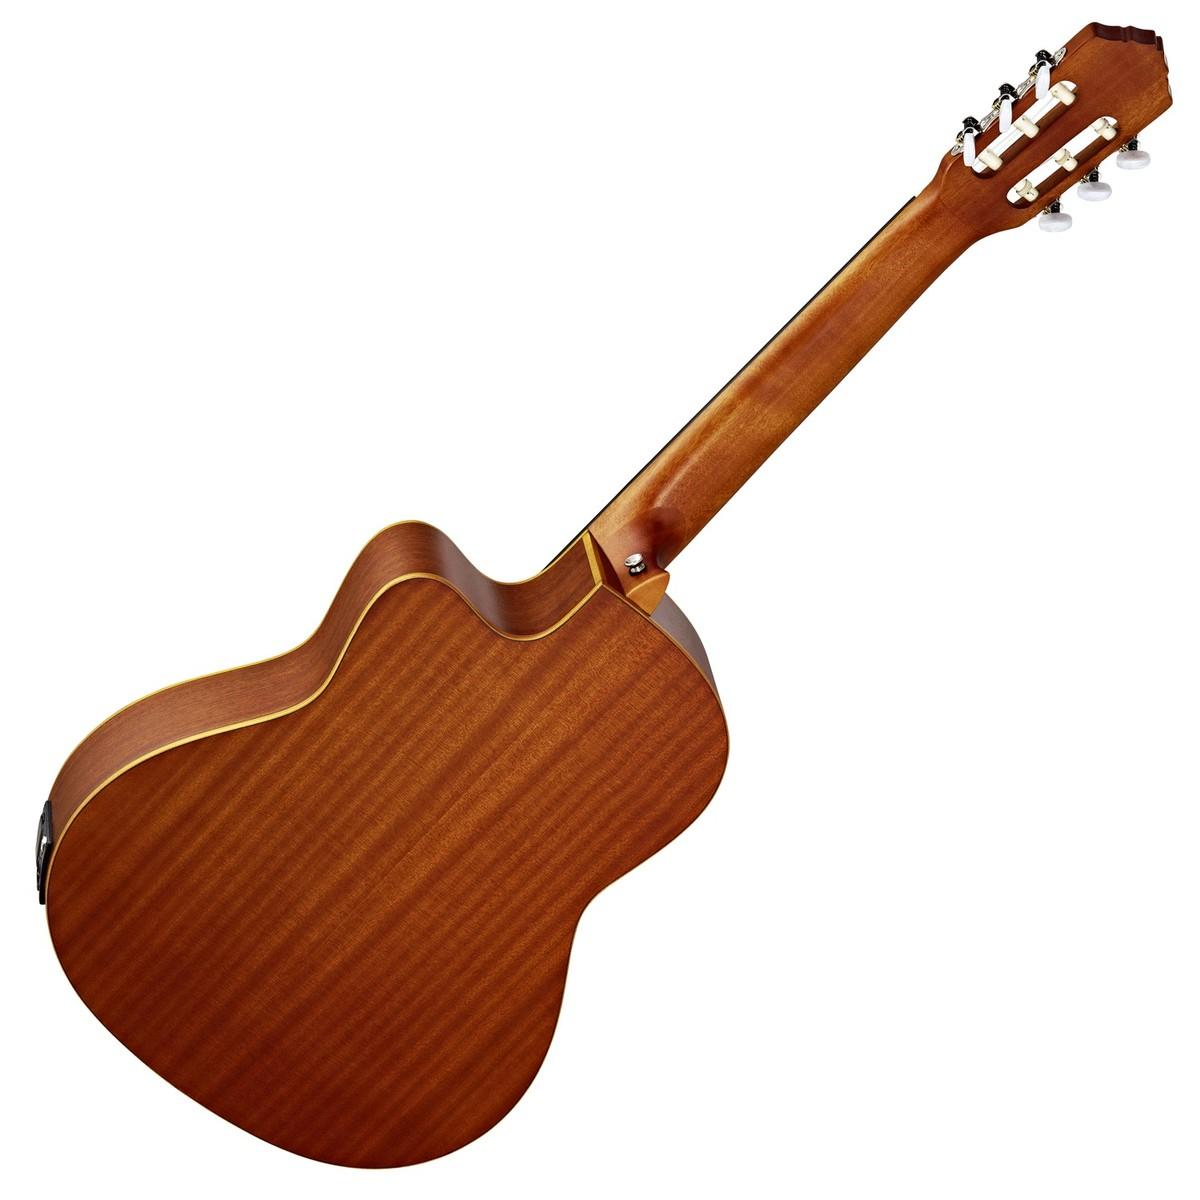 guitare classique electro rce131 de ortega. Black Bedroom Furniture Sets. Home Design Ideas